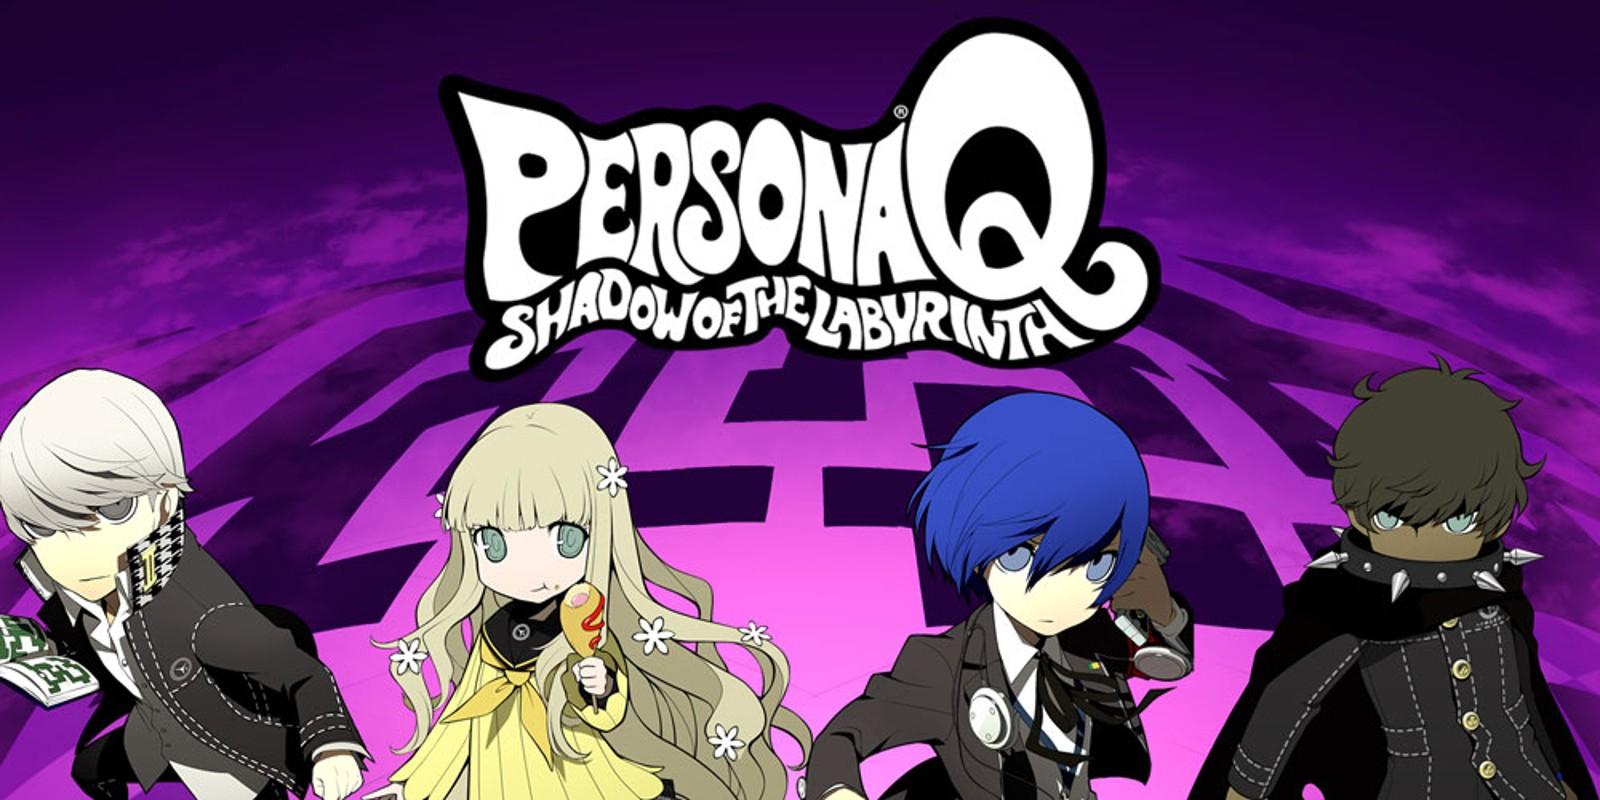 Persona Q: Shadow of the Labyrinth - 3DS - £8.99 @Nintendo Eshop (Q2 also in description)